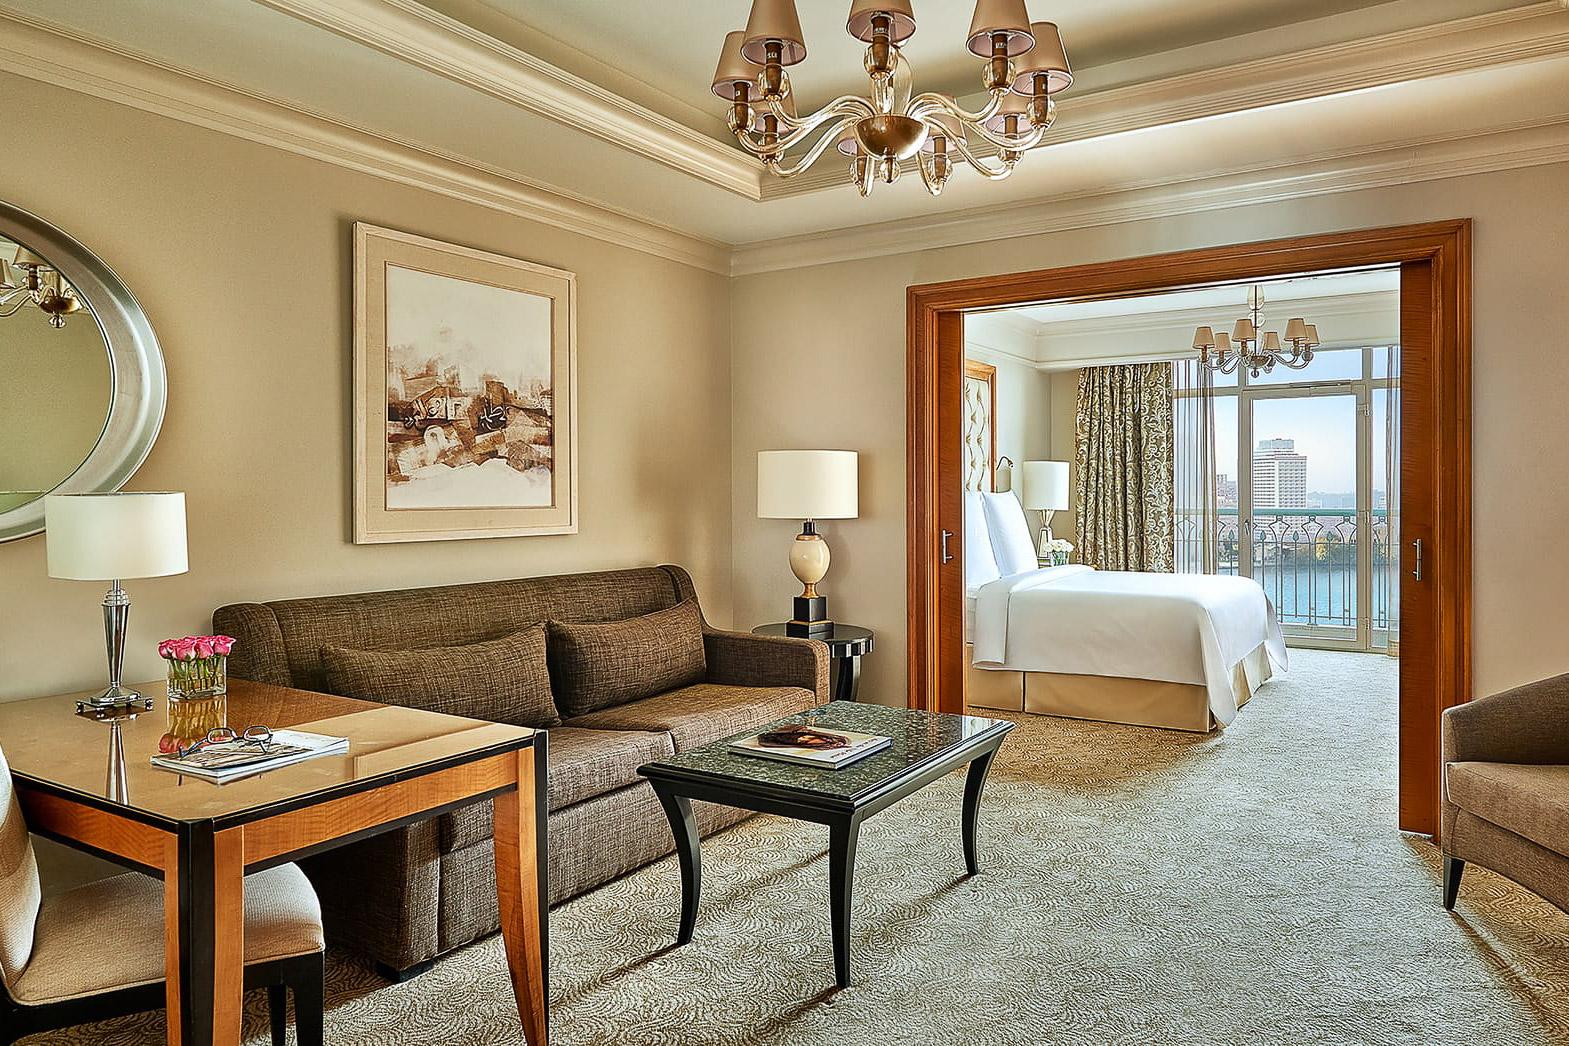 Four-Seasons-Hotel-Cairo-at-Nile-Plaza-4